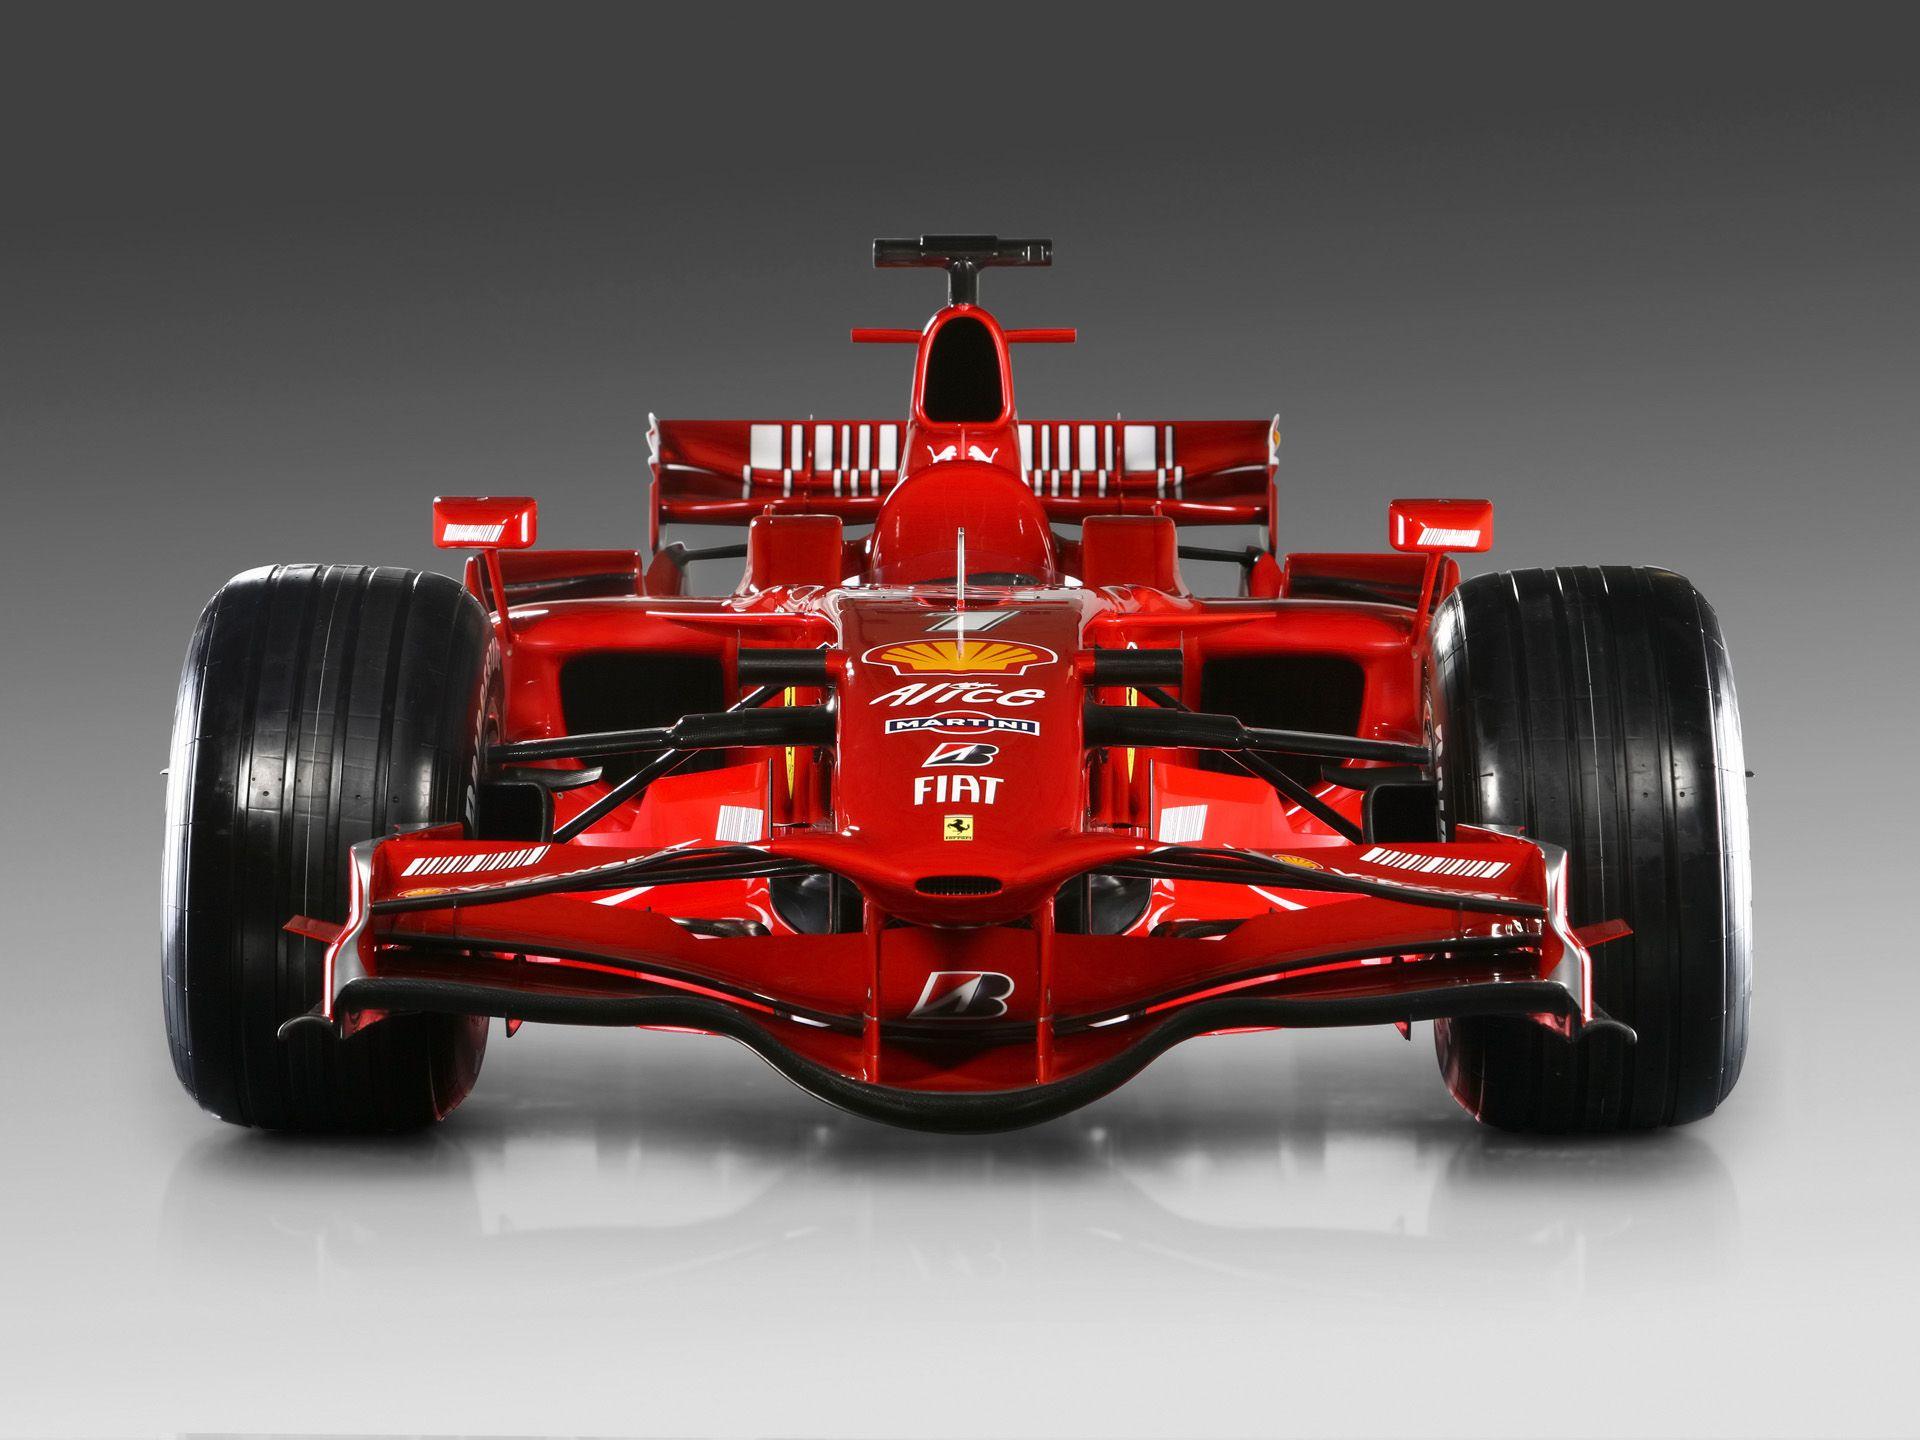 Ferrari F1 2015 Cool Cars Wallpapers